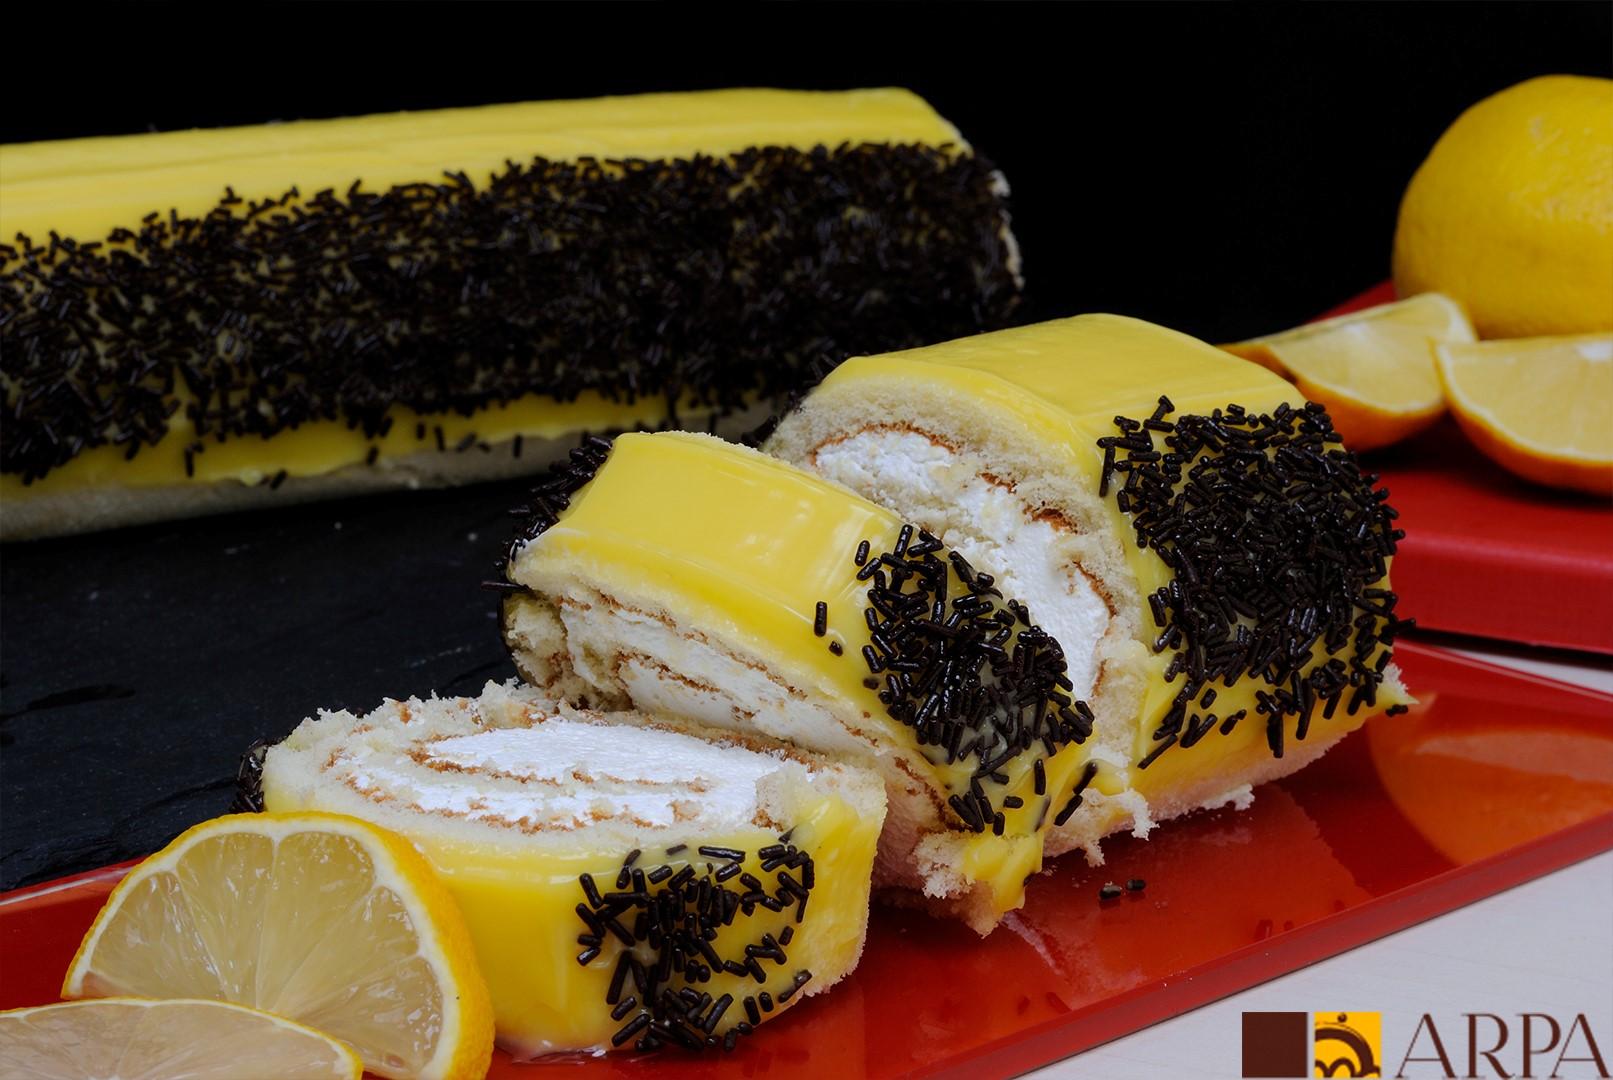 Brazo de gitano relleno de nara con limón y recubierto de una capa de crema de limón elaborada con limón natural